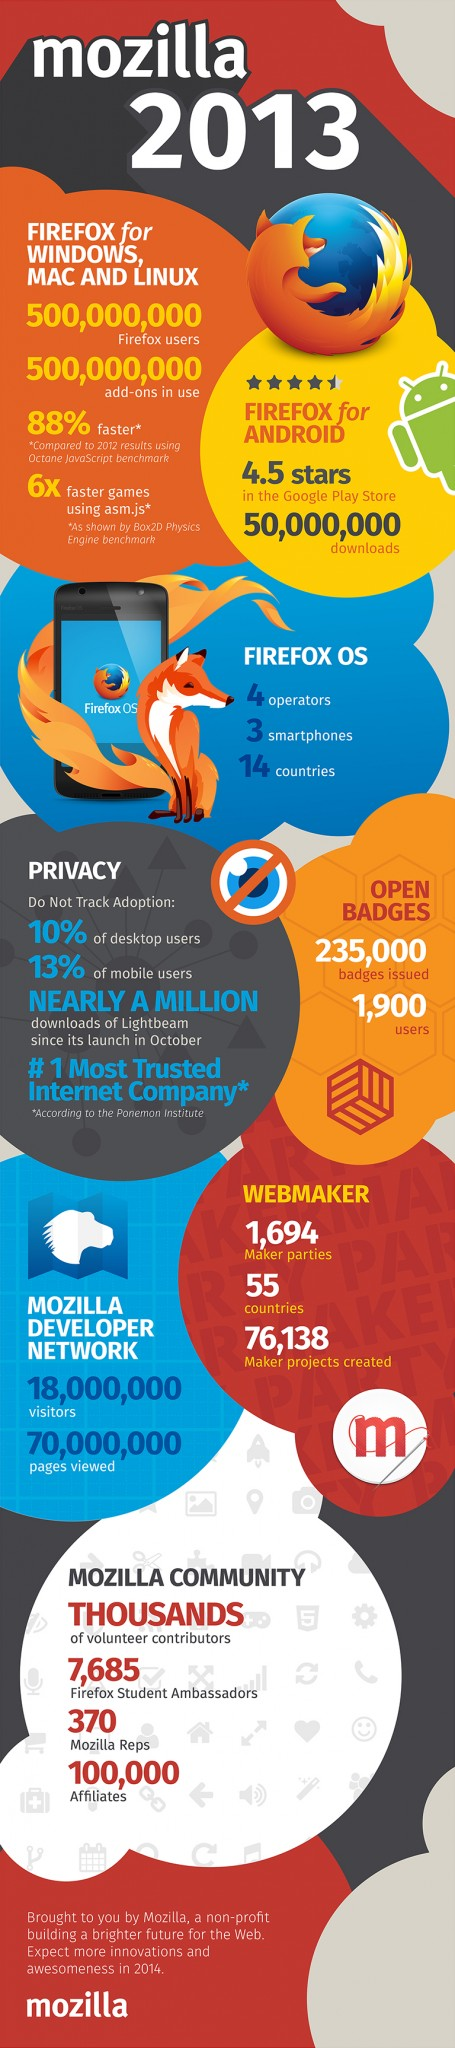 Mozilla 2013 (Quelle: blog.mozilla.org)